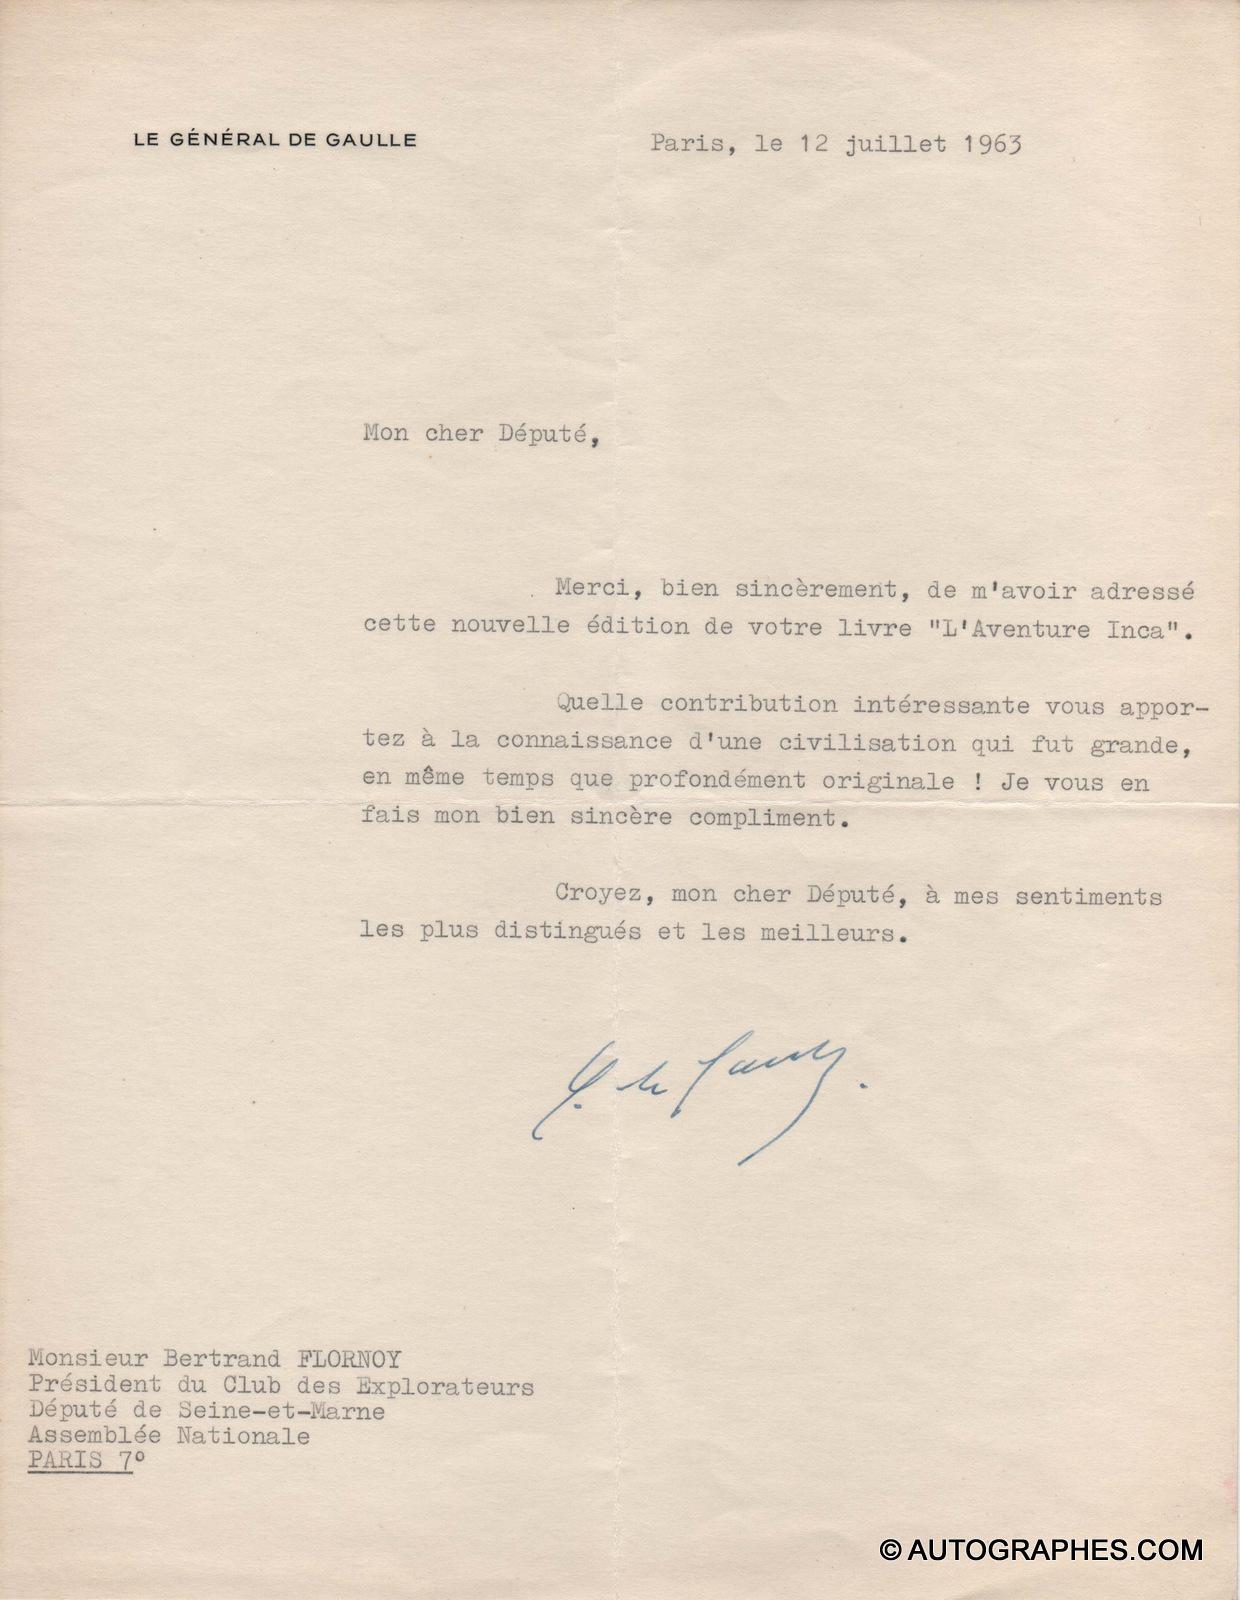 Lettre-dactylographiee-signee-general-de-gaulle-1963